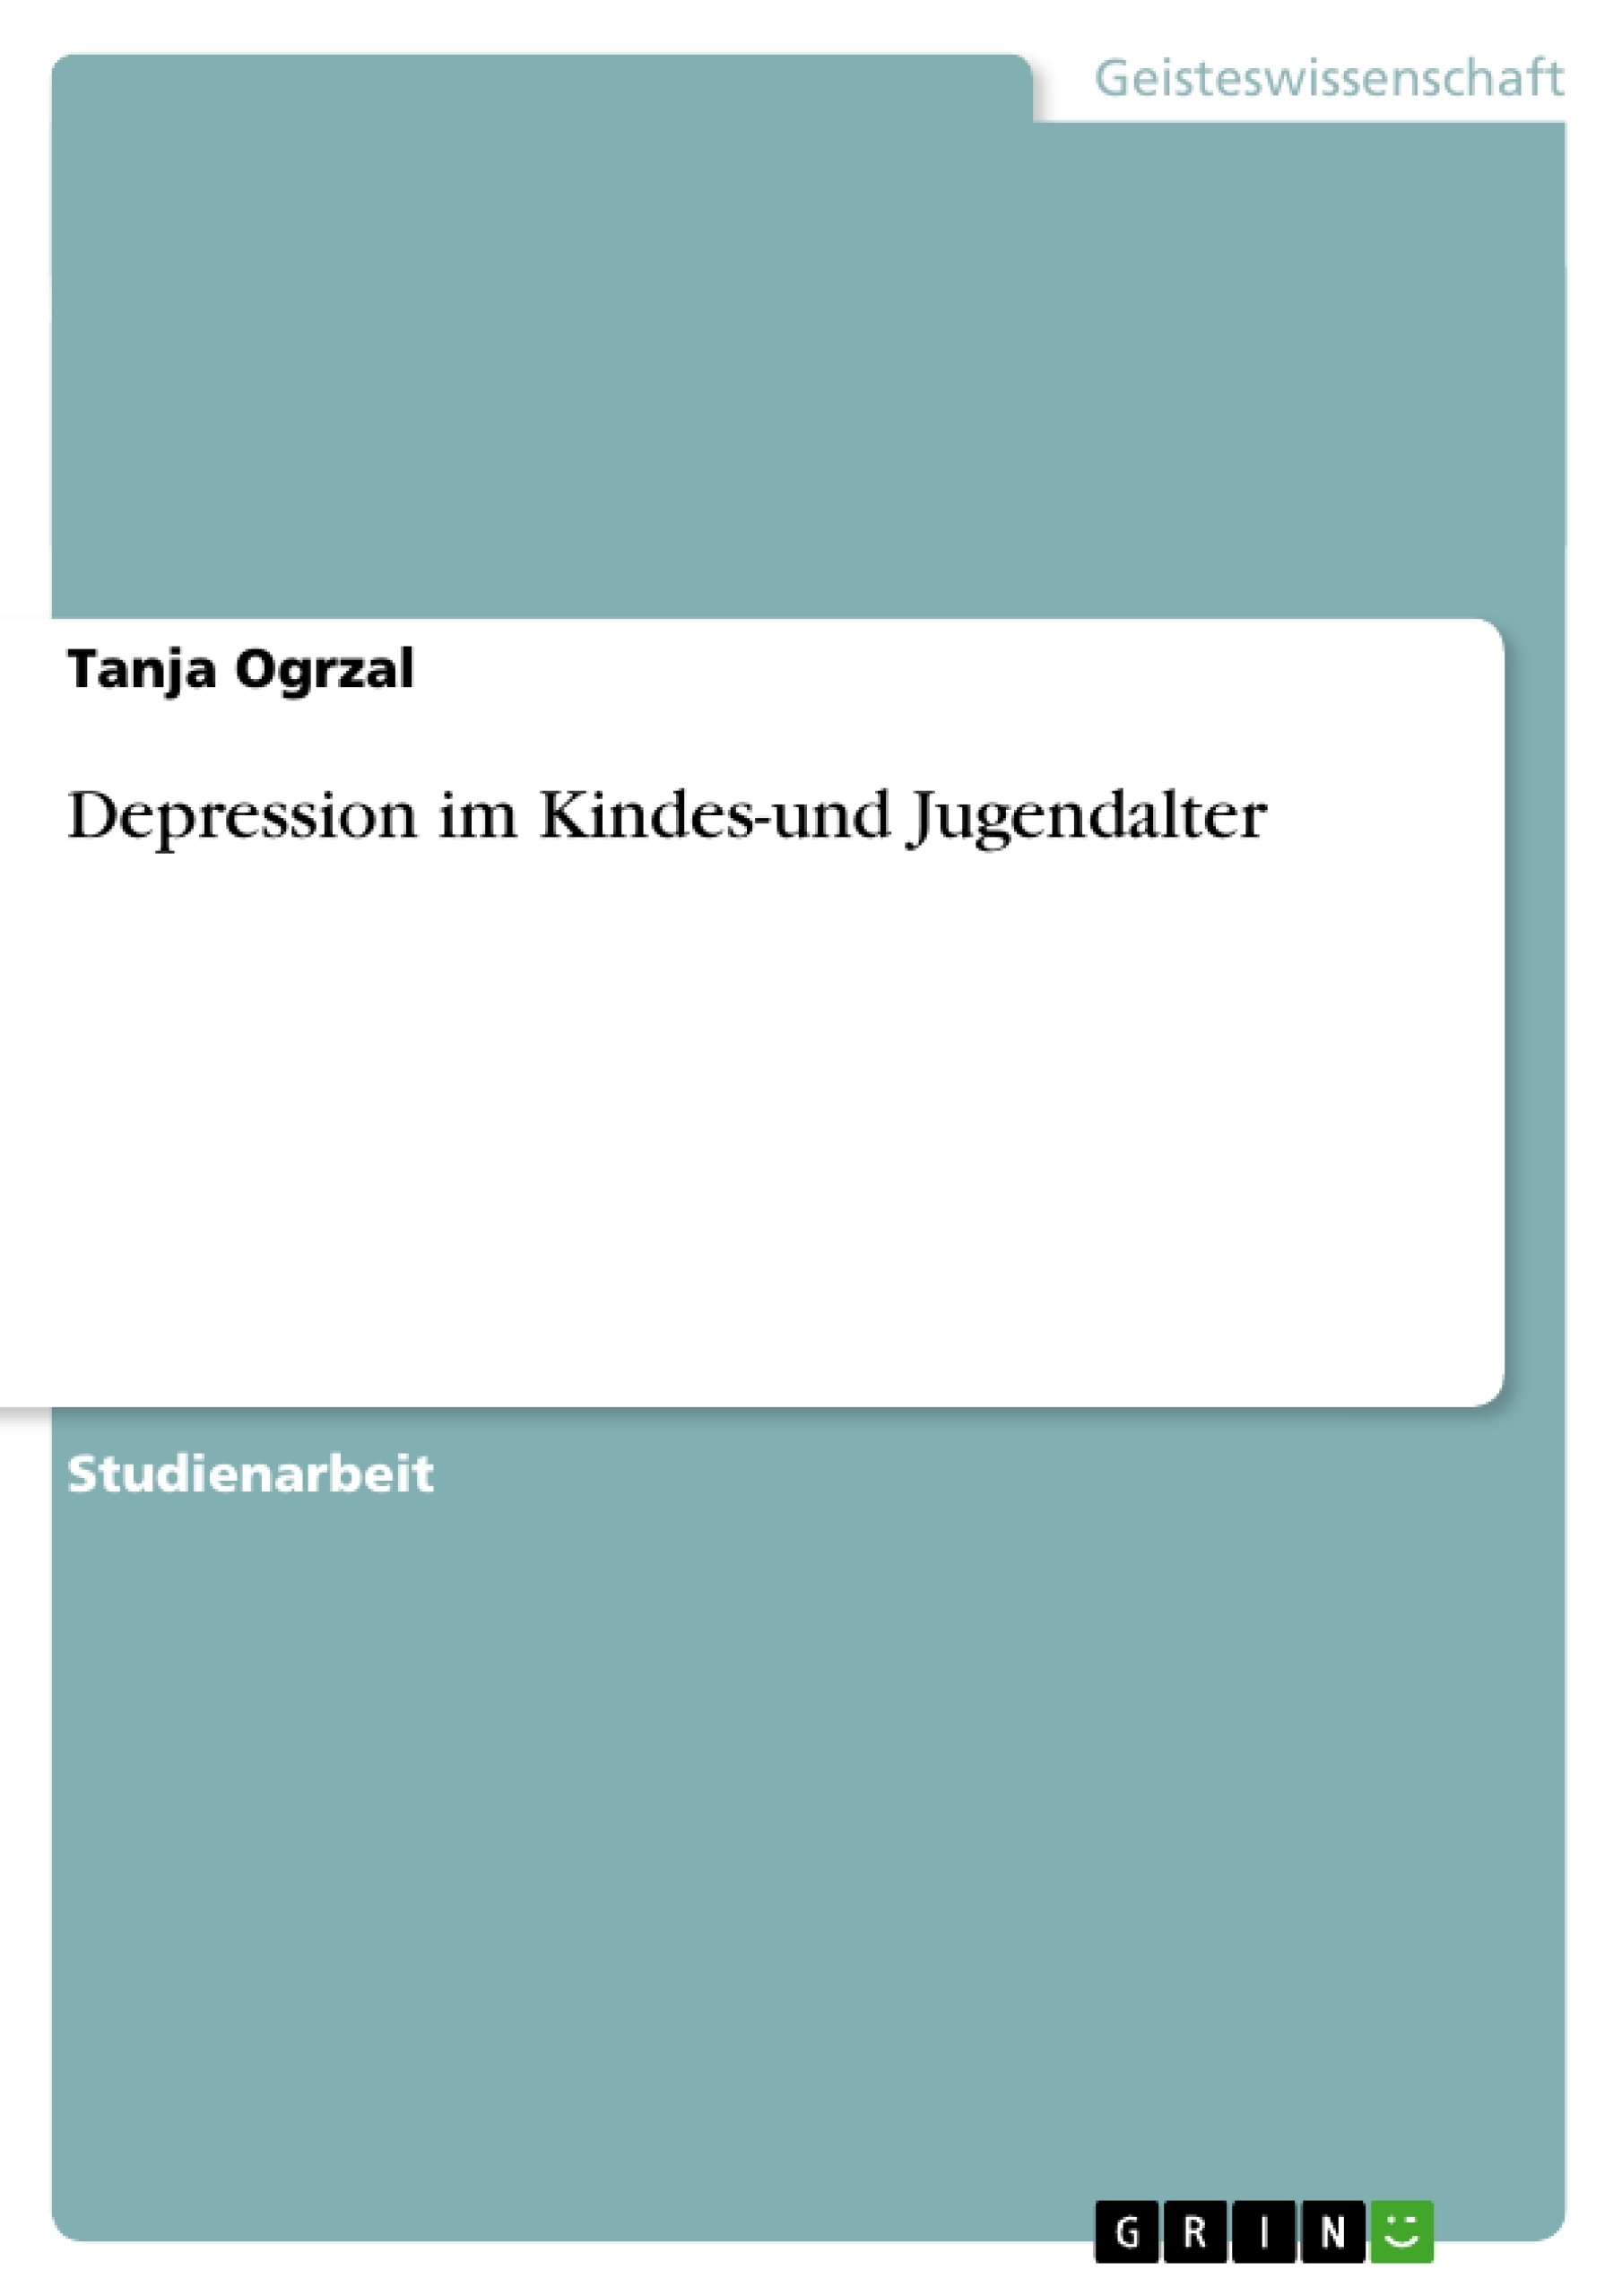 Titel: Depression im Kindes-und Jugendalter